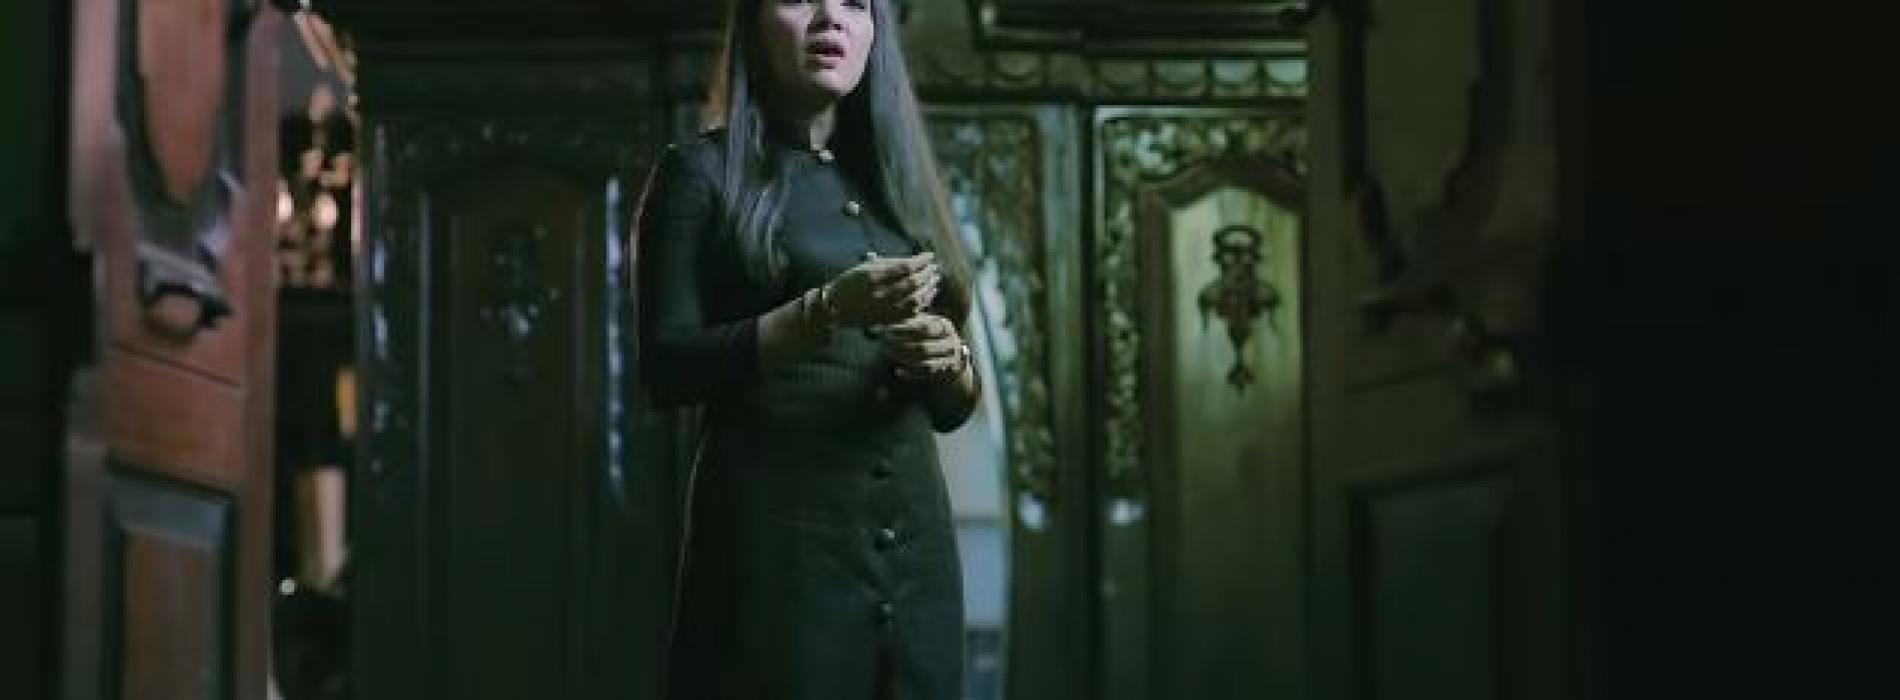 New Music : Ethera Soya (එතෙර සොයා) – Sashika Nisansala Official Music Video